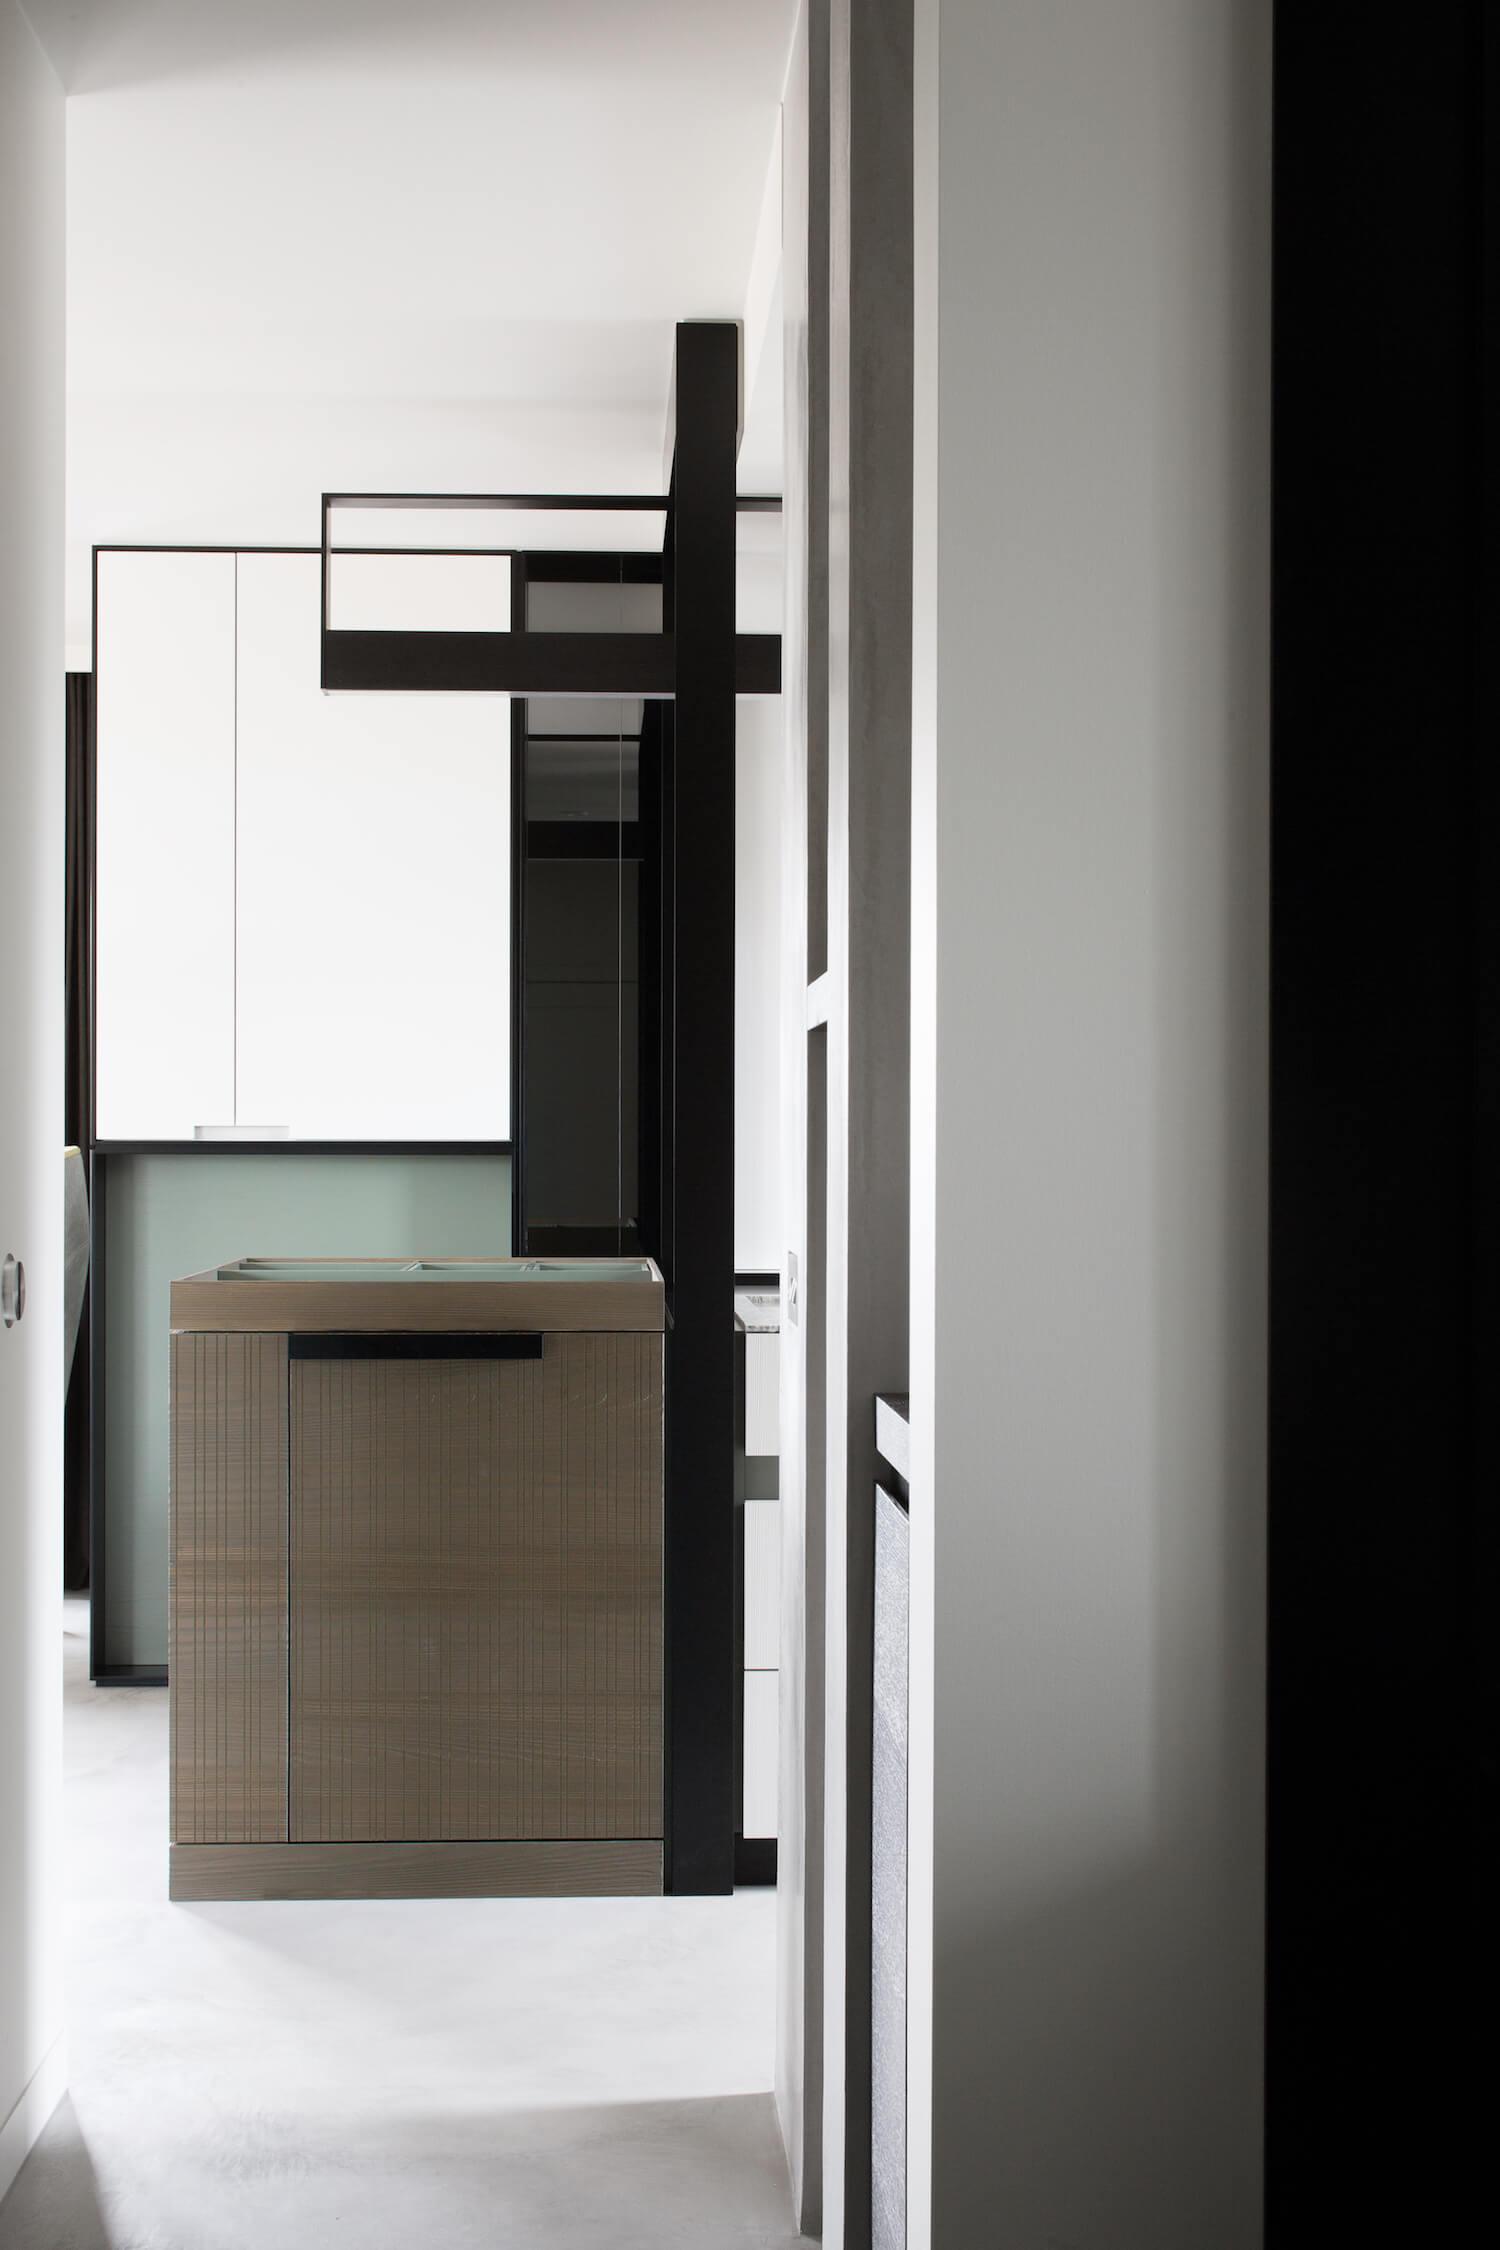 est living frederic kielemoes cafeine belgian apartment 16